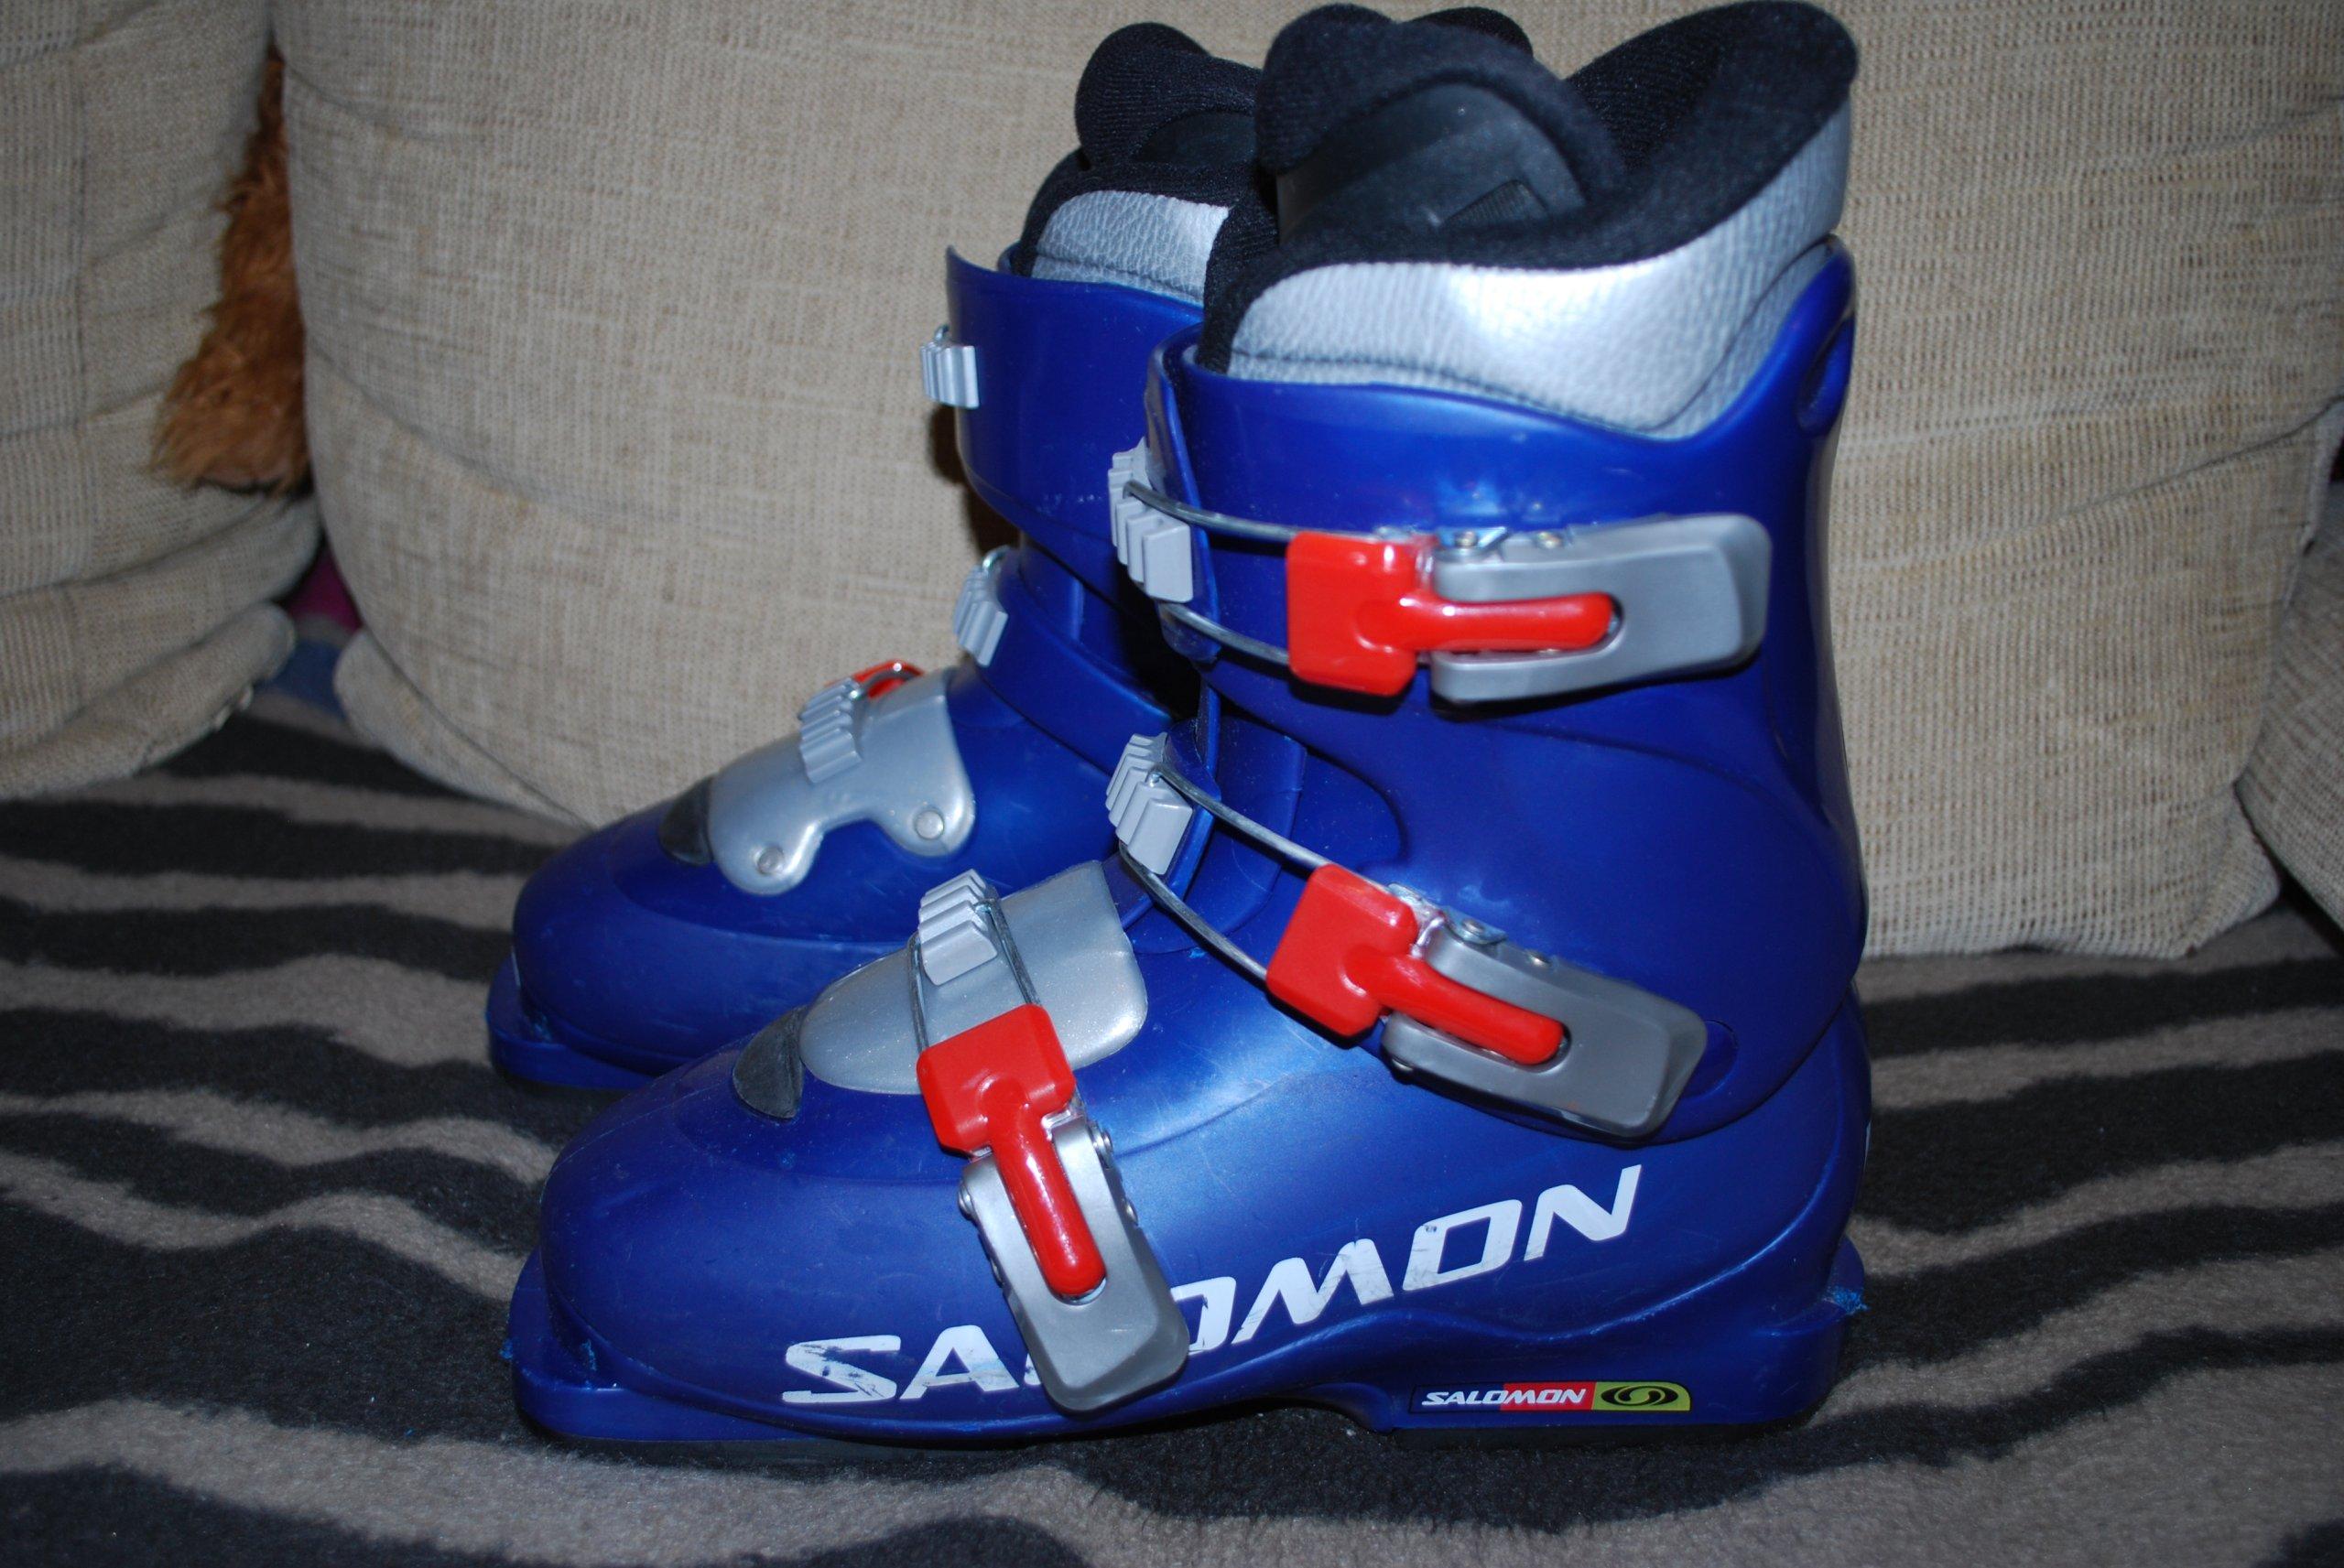 SALOMON PERFORMA T3 UK5 EUR 38 made in ITALY